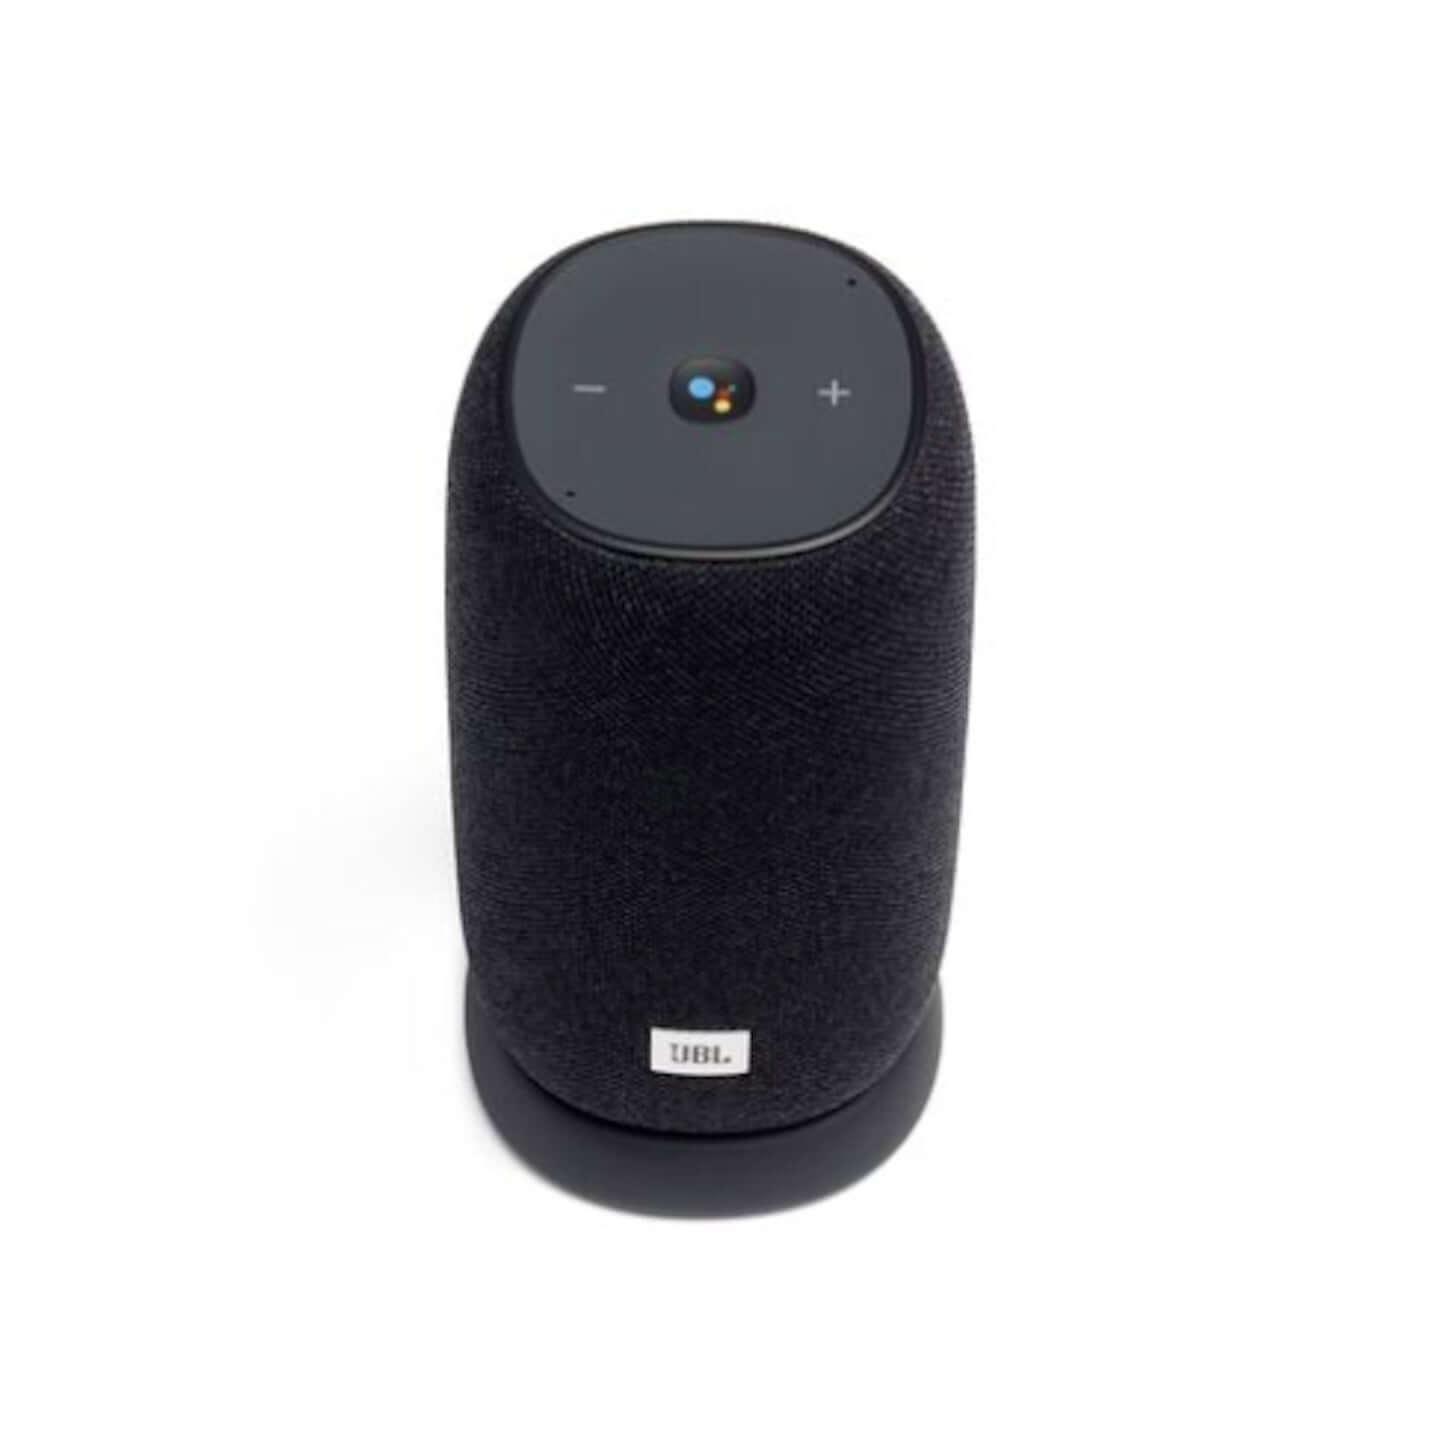 JBLからGoogle アシスタントを搭載したスマートスピーカーJBL LINK Portableが発売 tech191119_jbllinkportable_02-1440x1443